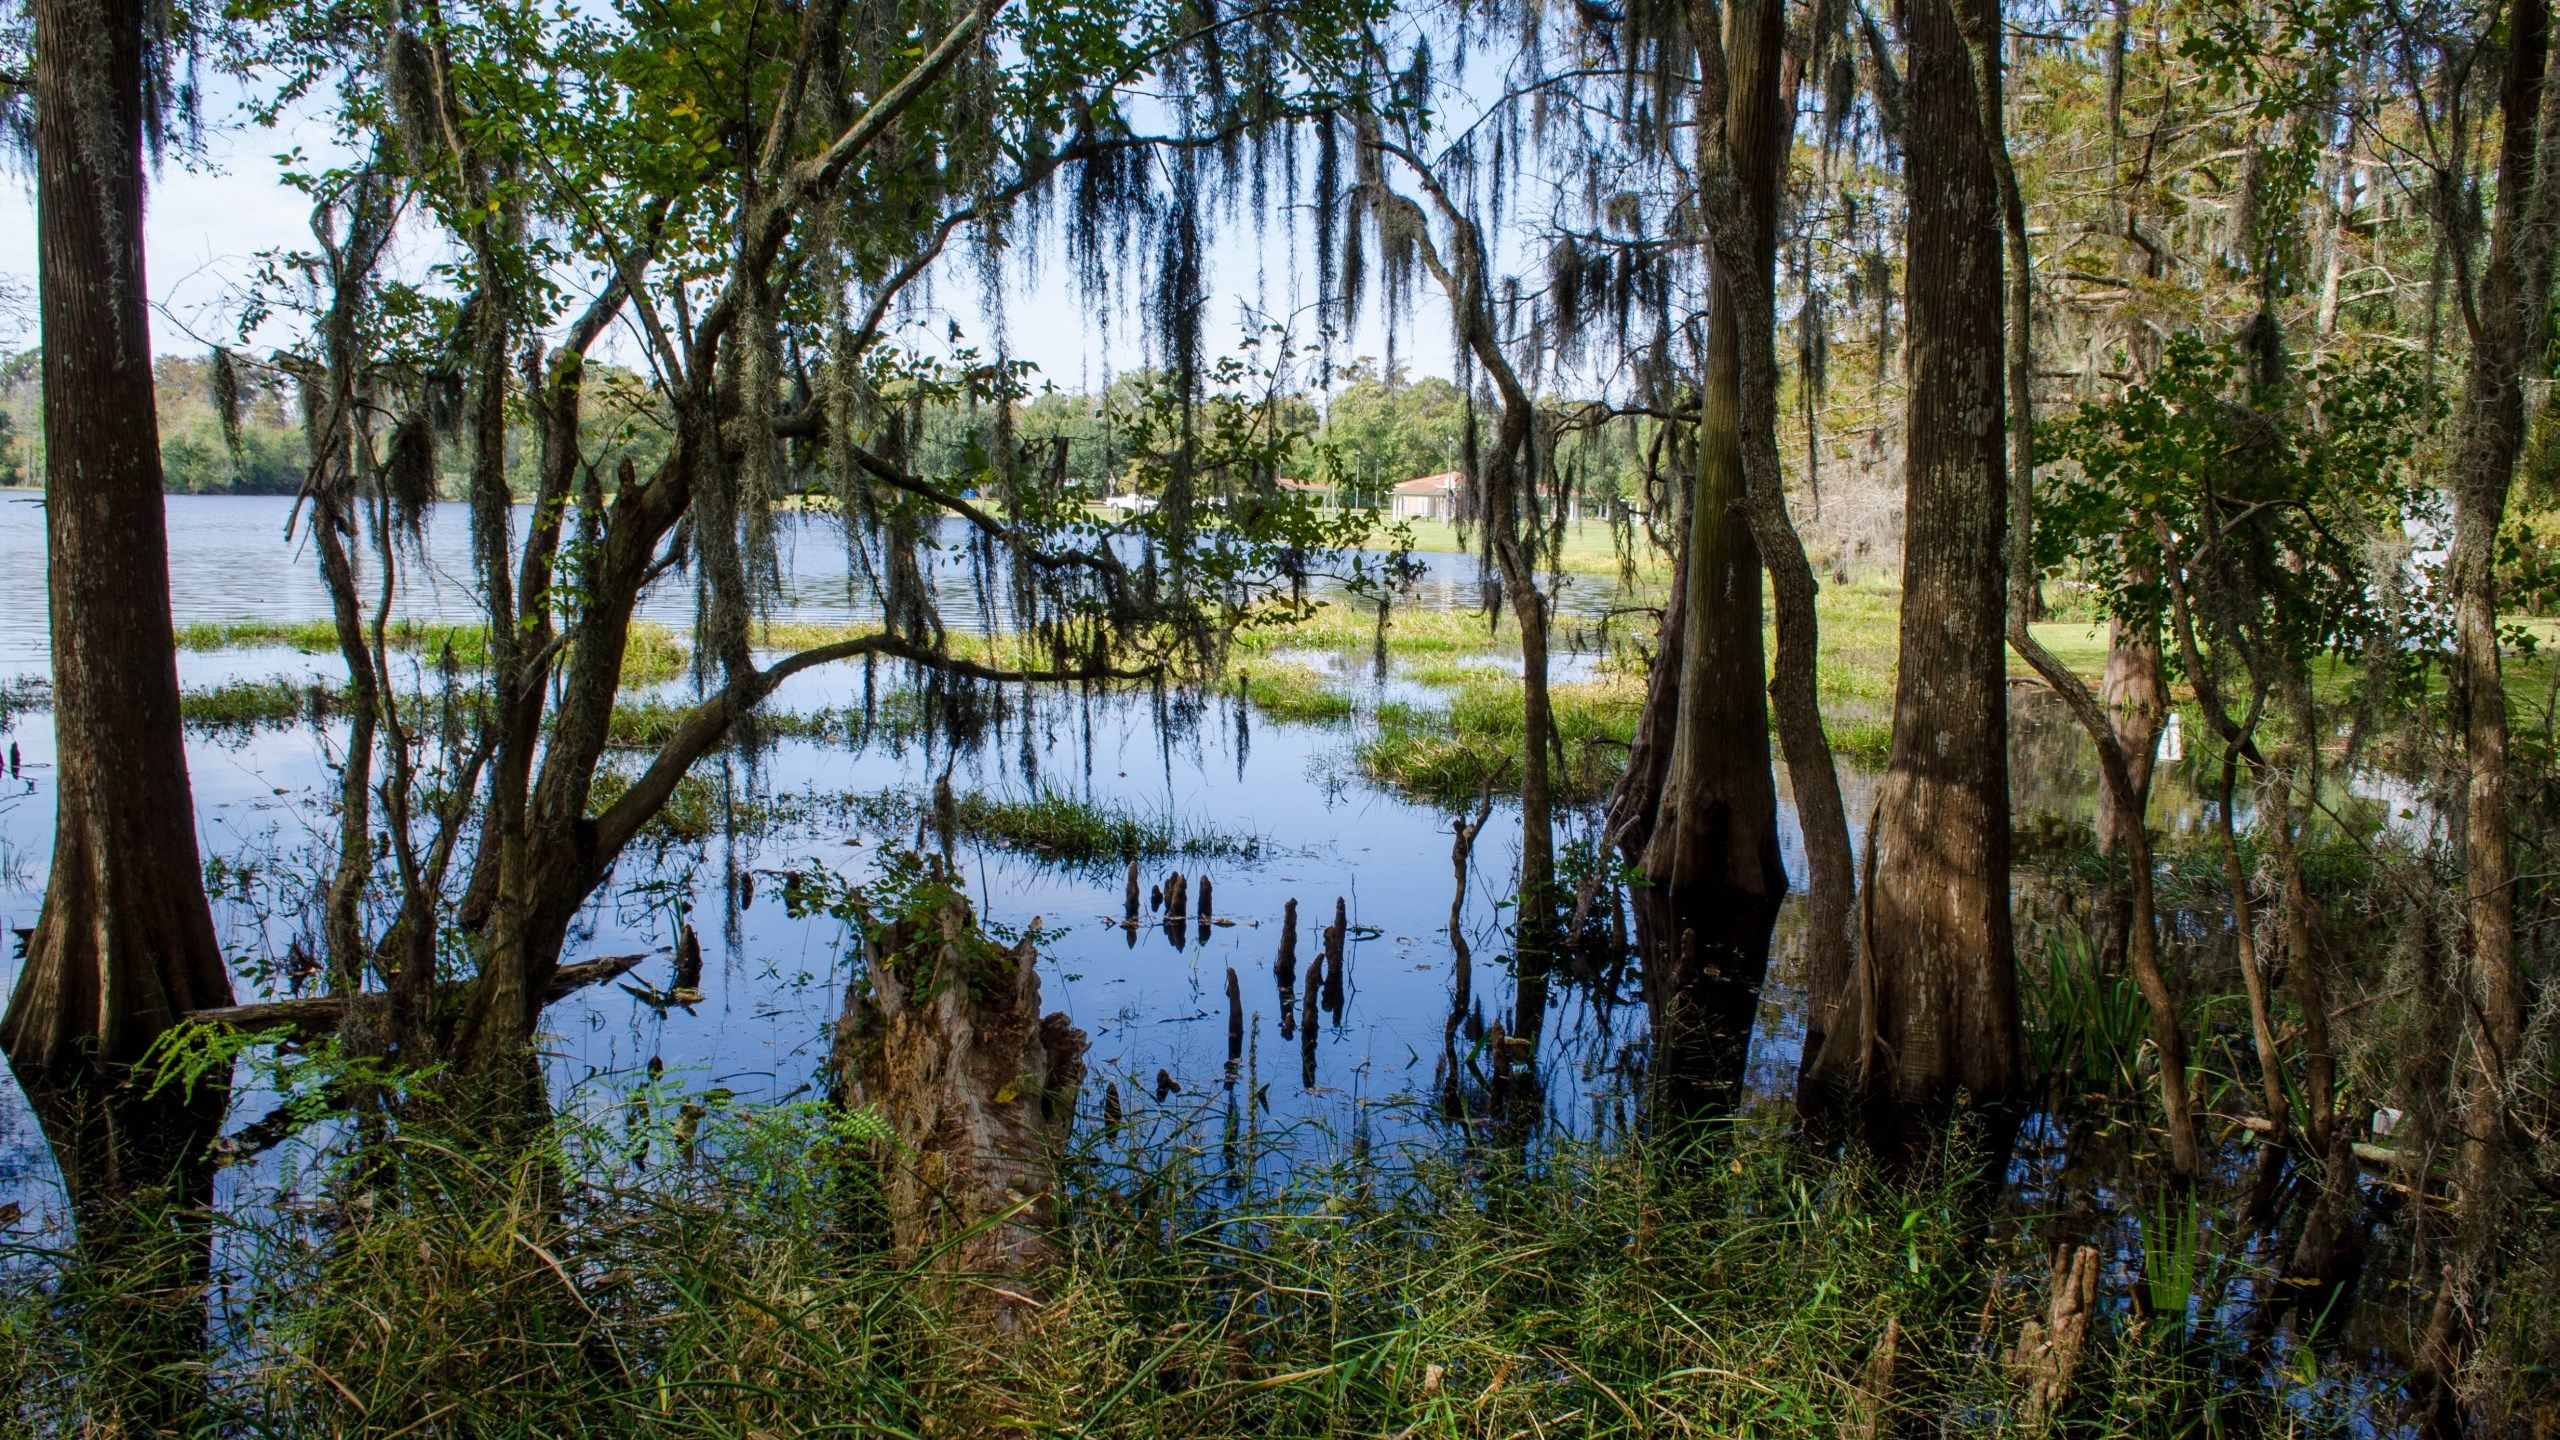 20170310 swamp wallpaper 1080p windows, 1844046